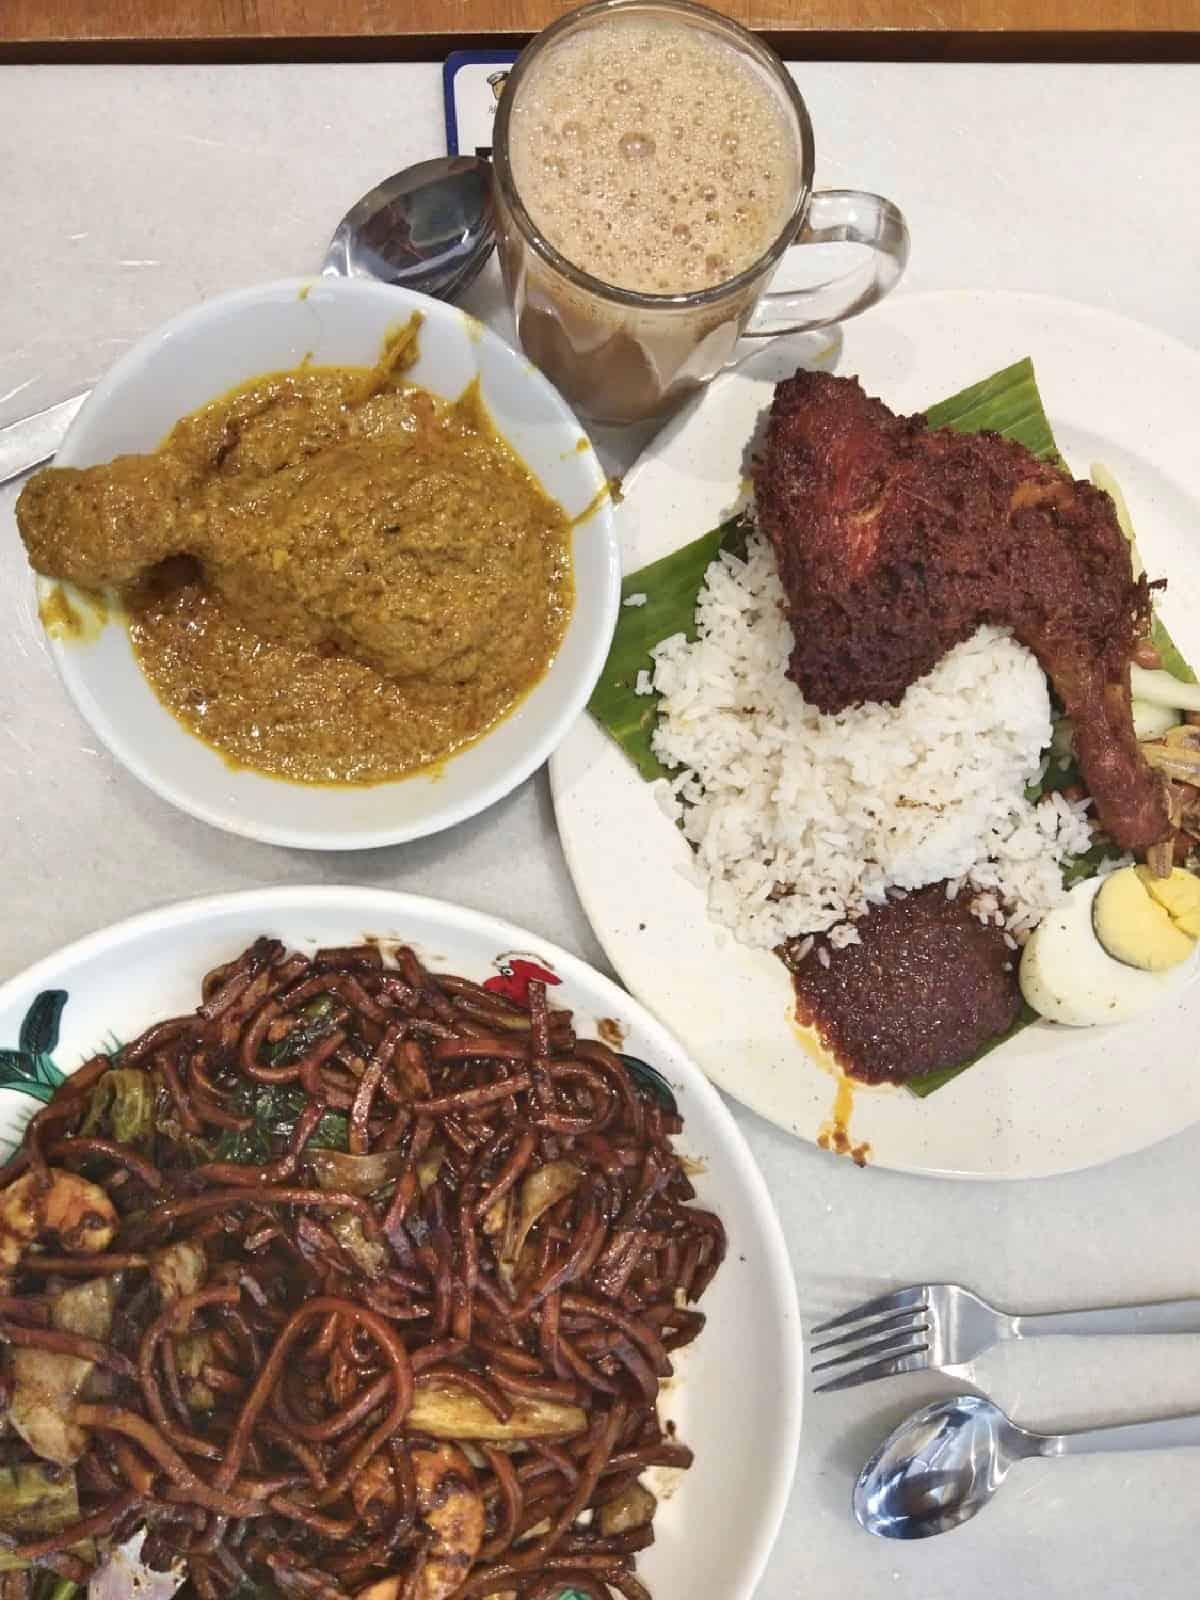 best-Malaysian-foods-to-try-in-Kuala-Lumpur-Ali, Muthu-&-Ah-Hoc-Kopitiam-Travel-Mermaid 01